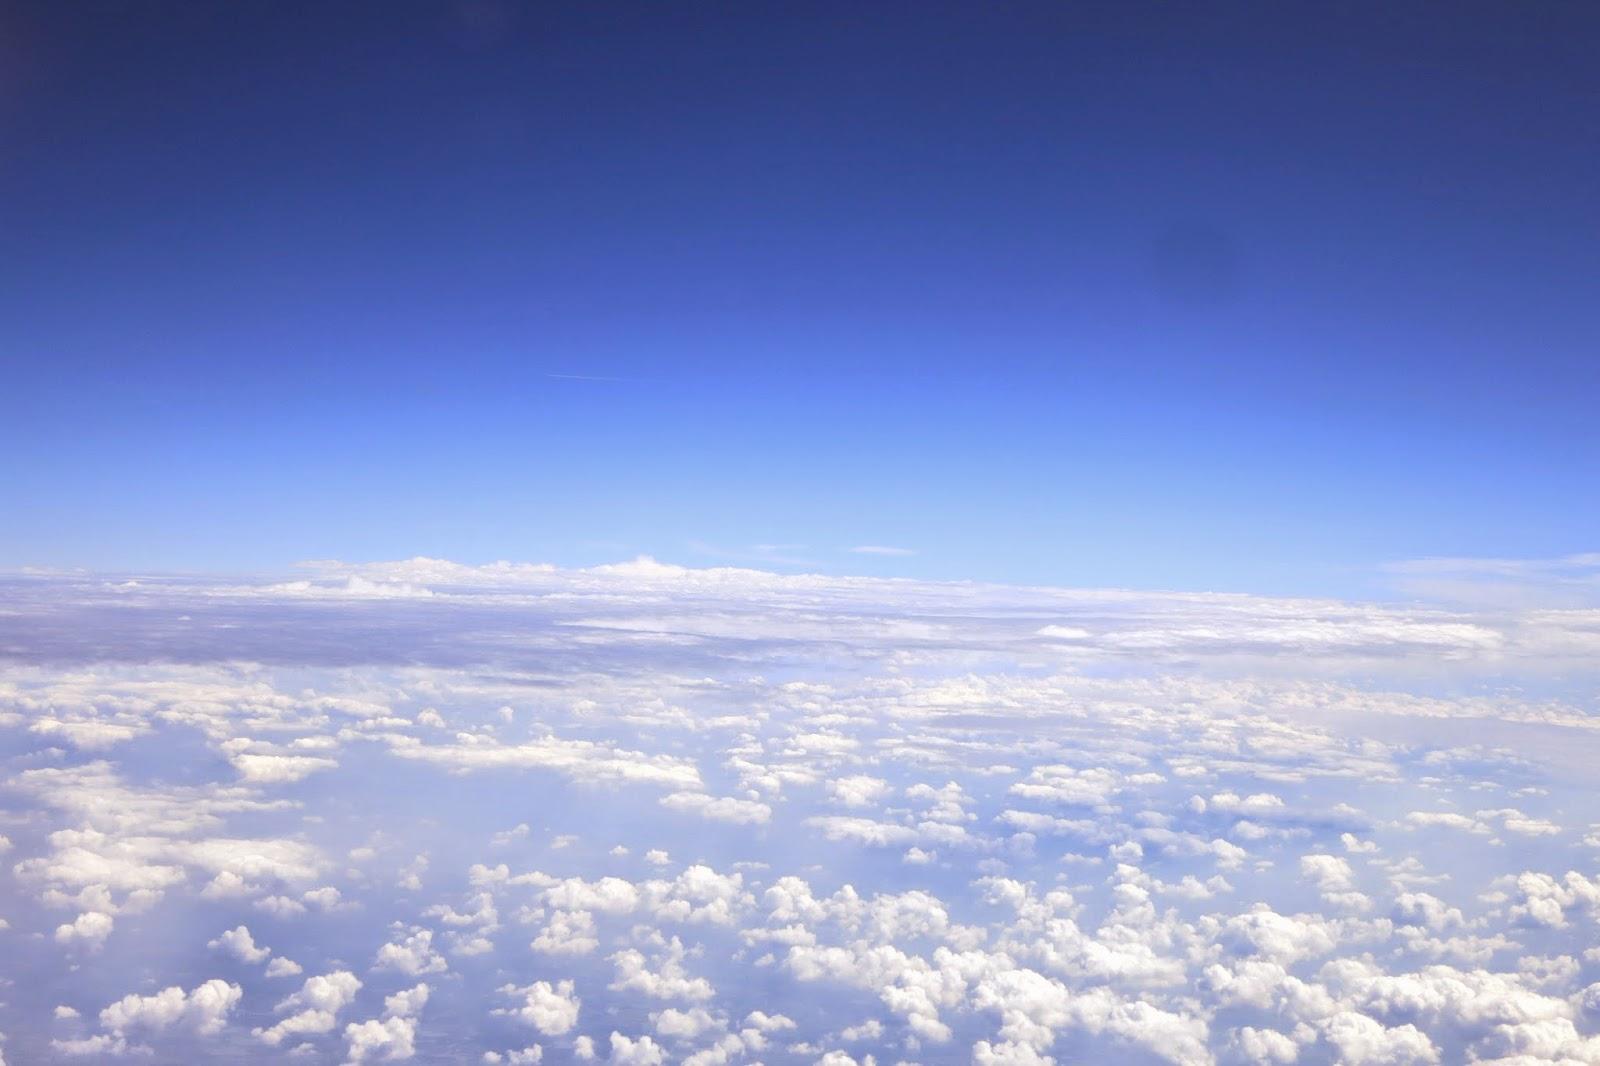 fly away,partir,avion,nuages